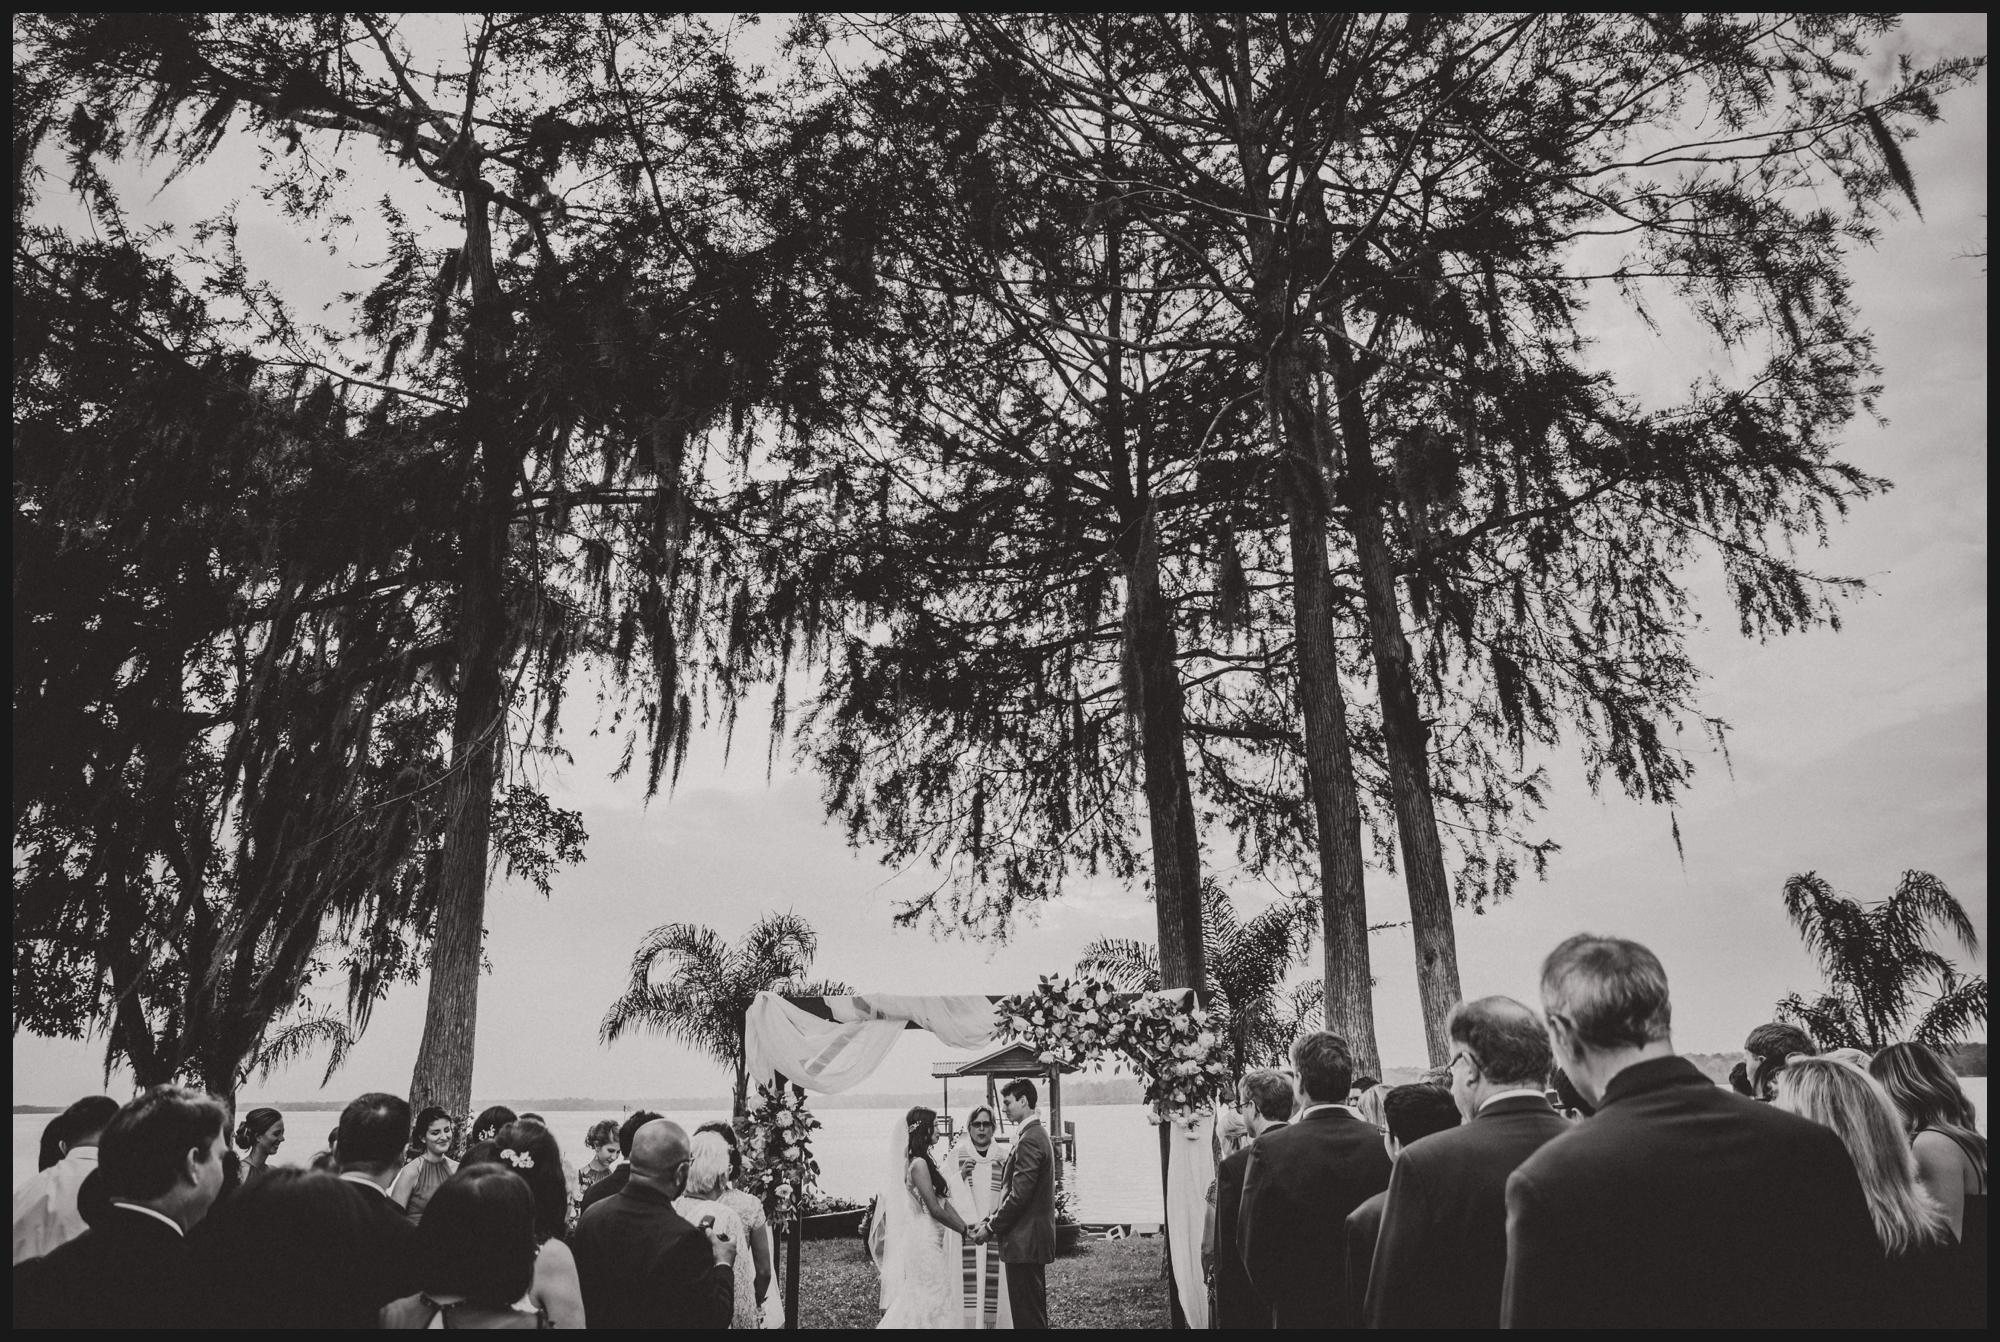 Orlando-Wedding-Photographer-destination-wedding-photographer-florida-wedding-photographer-bohemian-wedding-photographer_1429.jpg